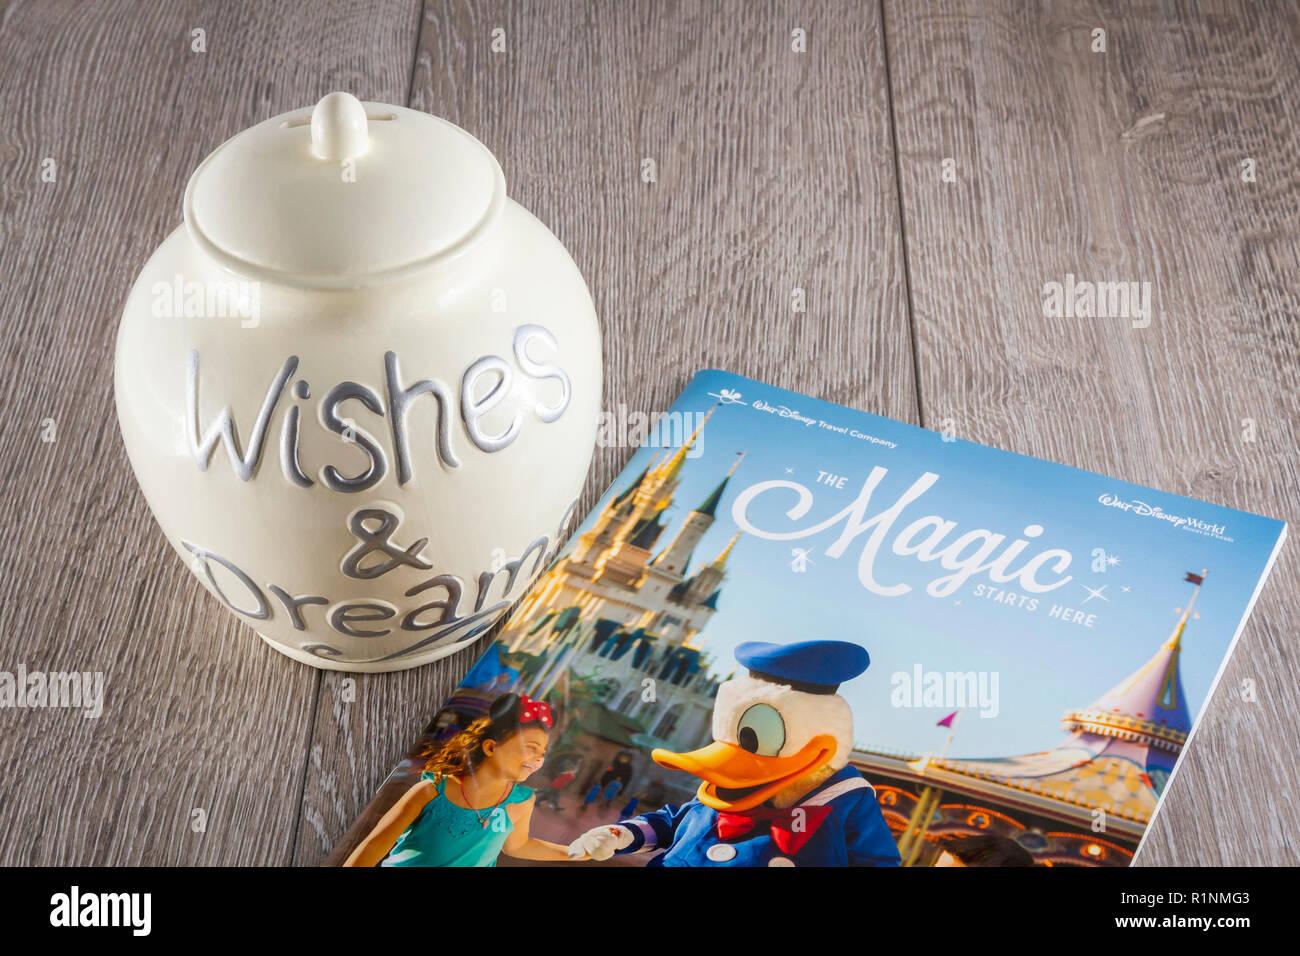 Savings Jar with a Walt Disney World Travel Brochure - Stock Image